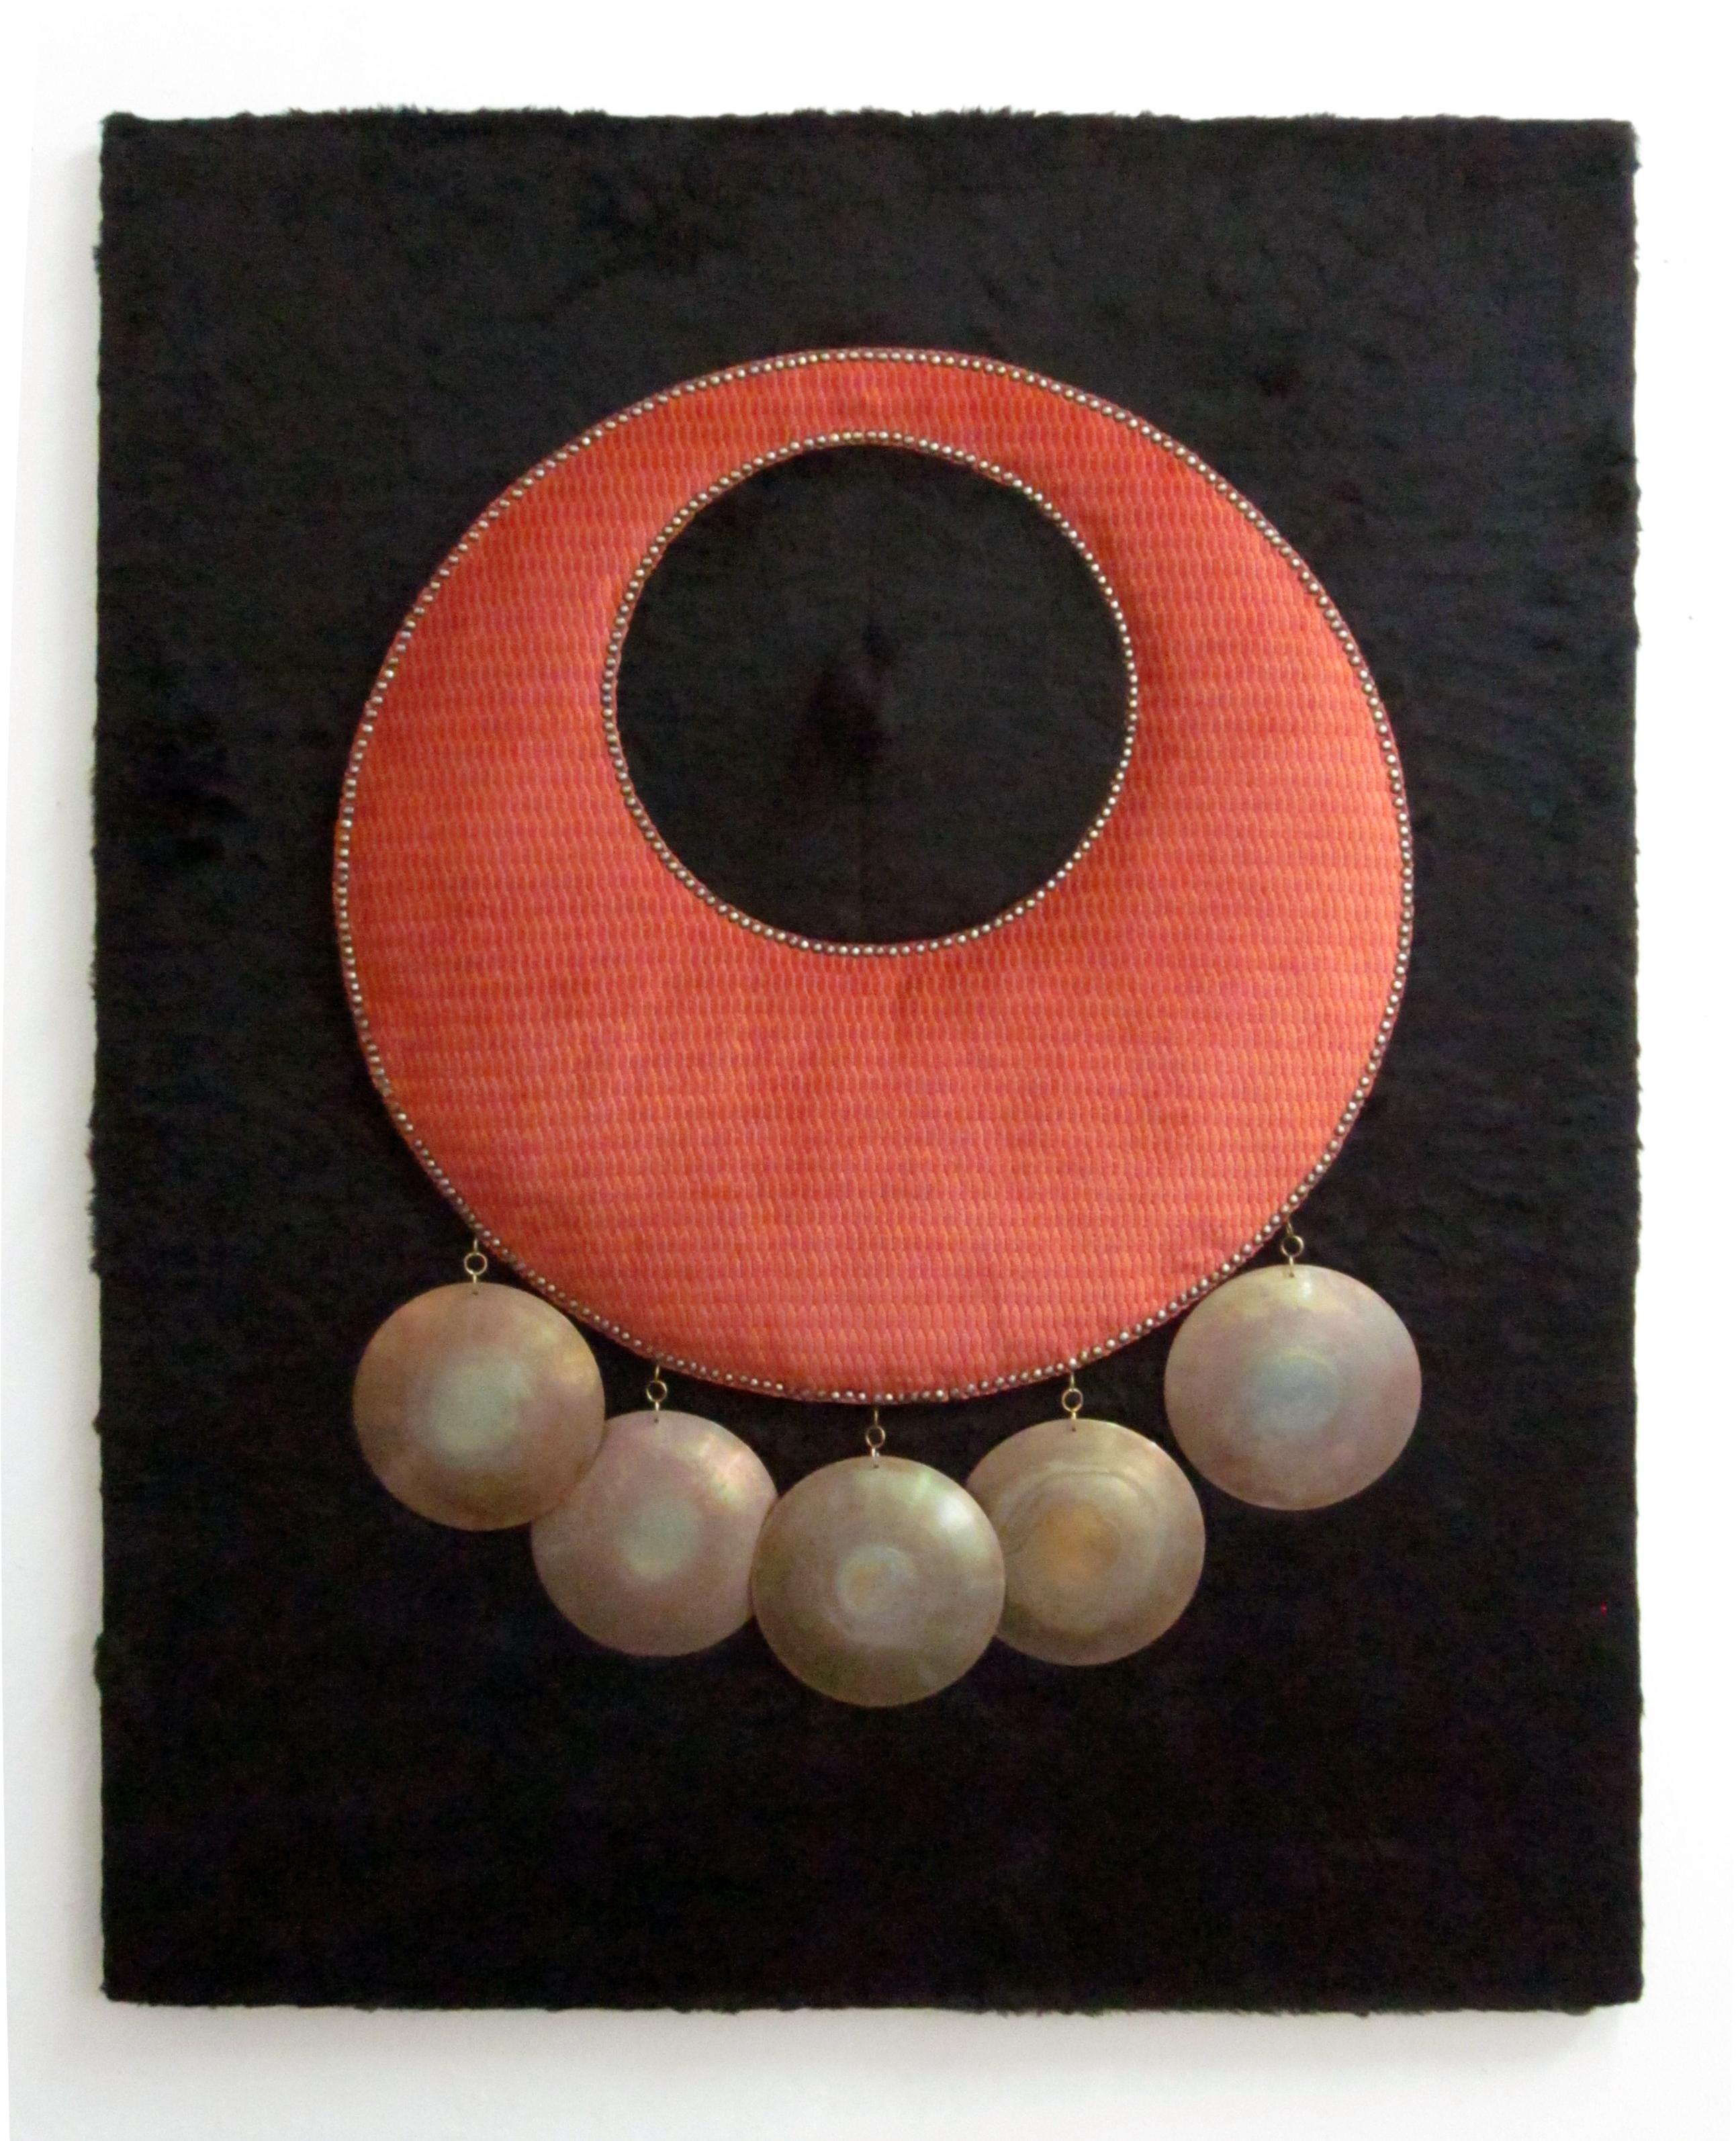 Untitled (Earring), 2012